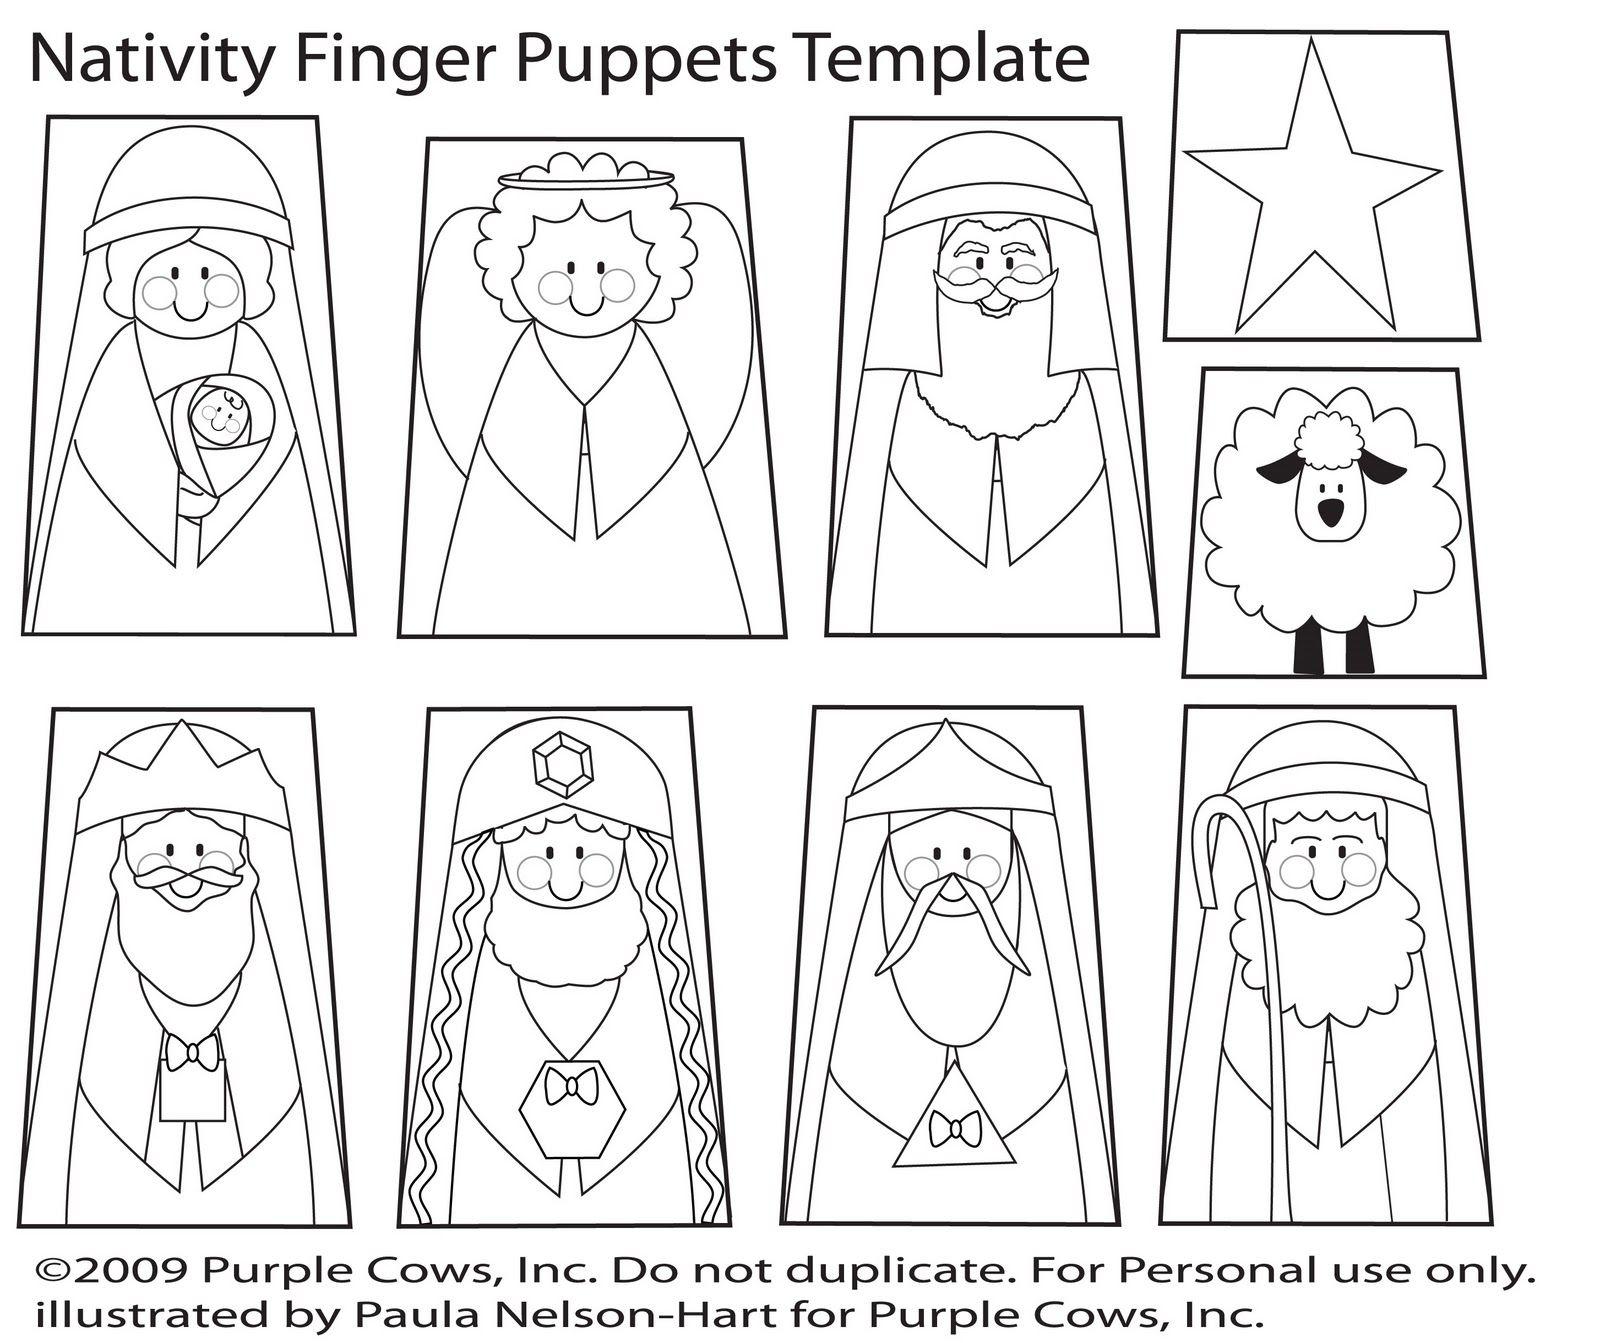 nativity puppet template Bijbel